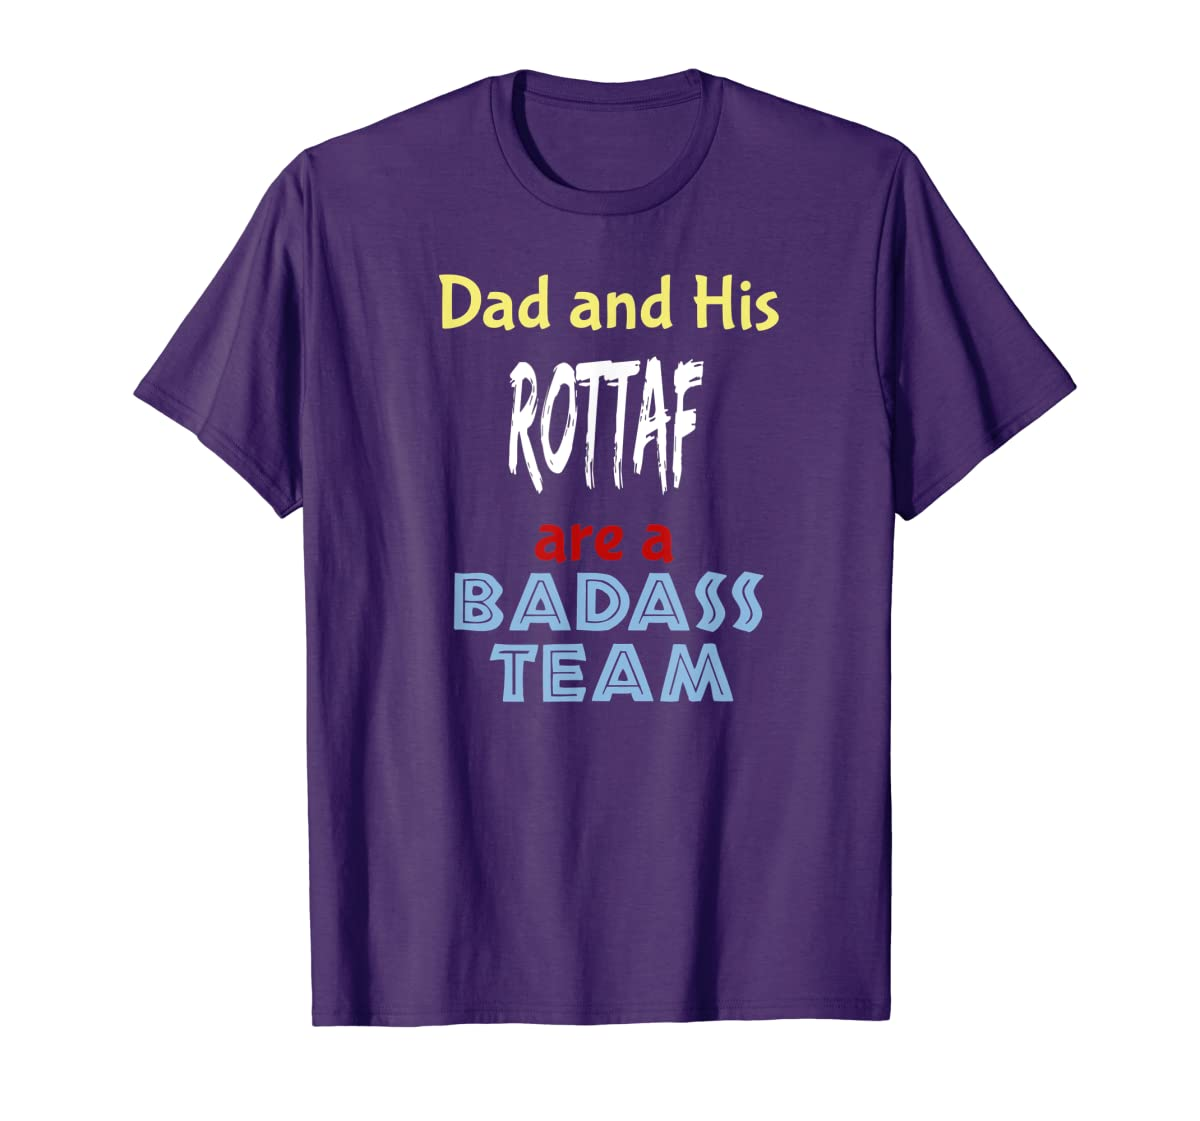 Mens Rottaf Dog Shirt Love Rottweiler + Afghan Hound = T-Shirt-Men's T-Shirt-Purple